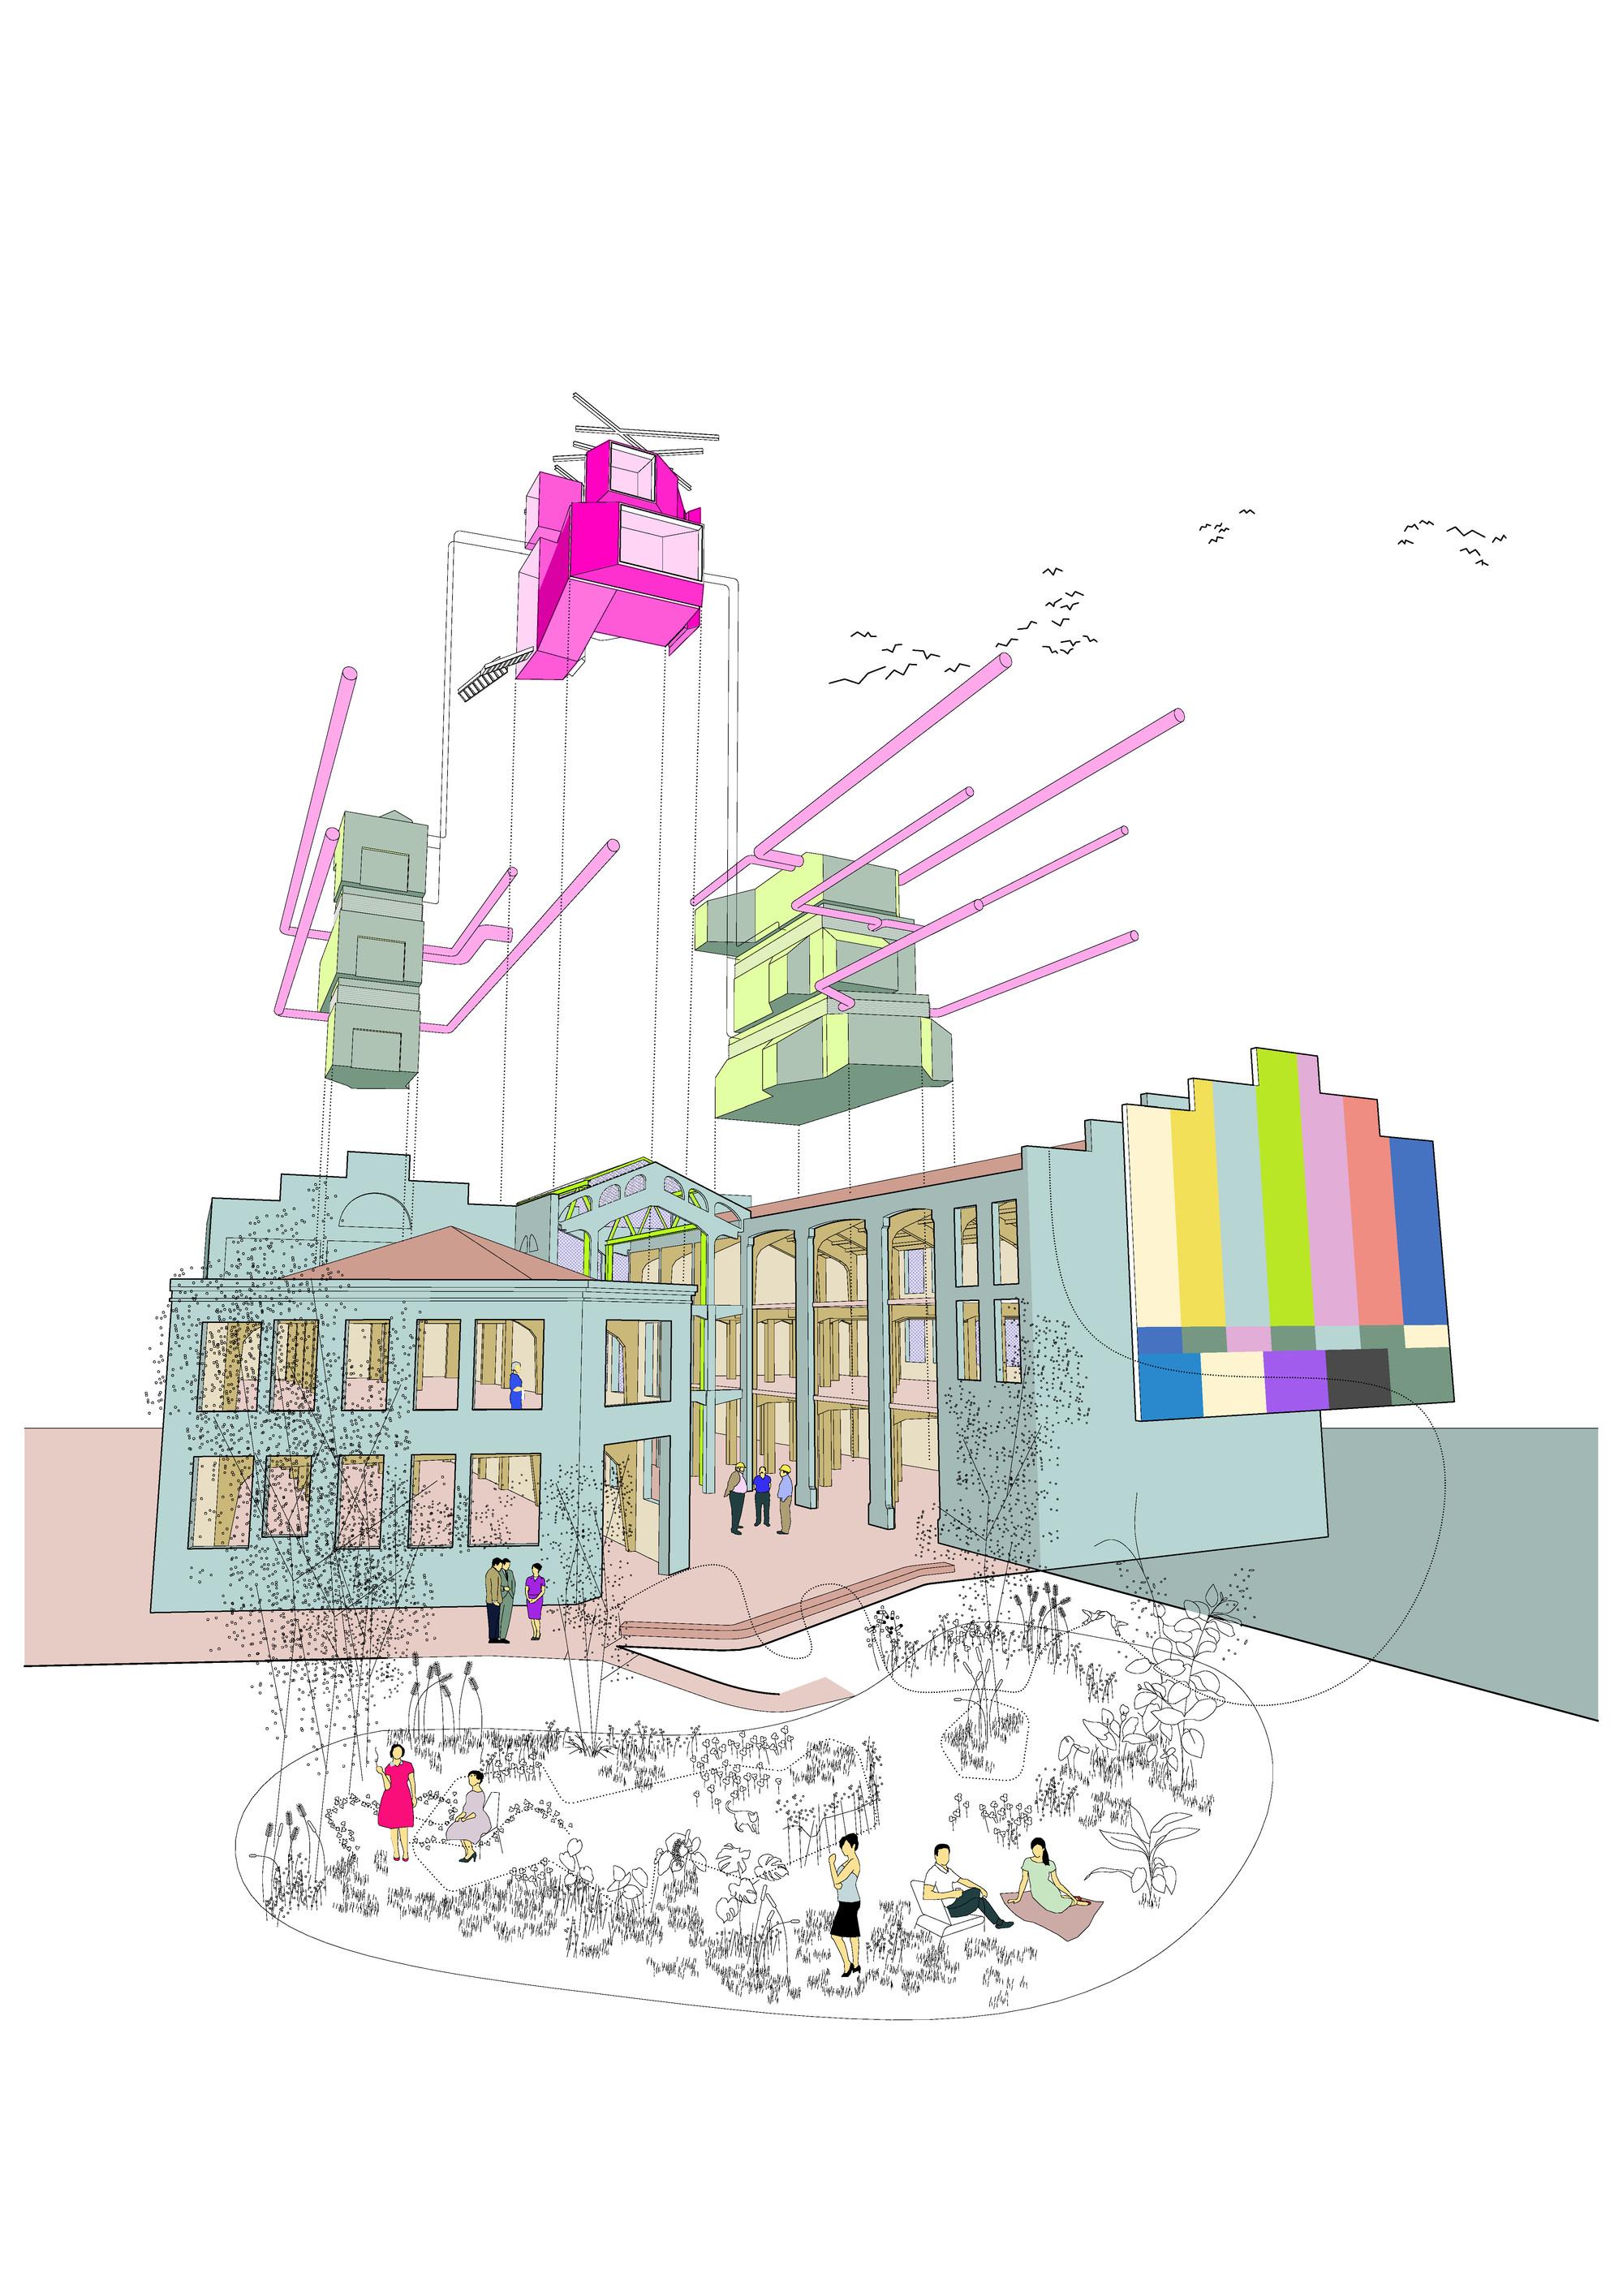 lab tree diagram guitar wiring diagrams 3 pickups gallery of medialab prado langarita navarro arquitectos 7